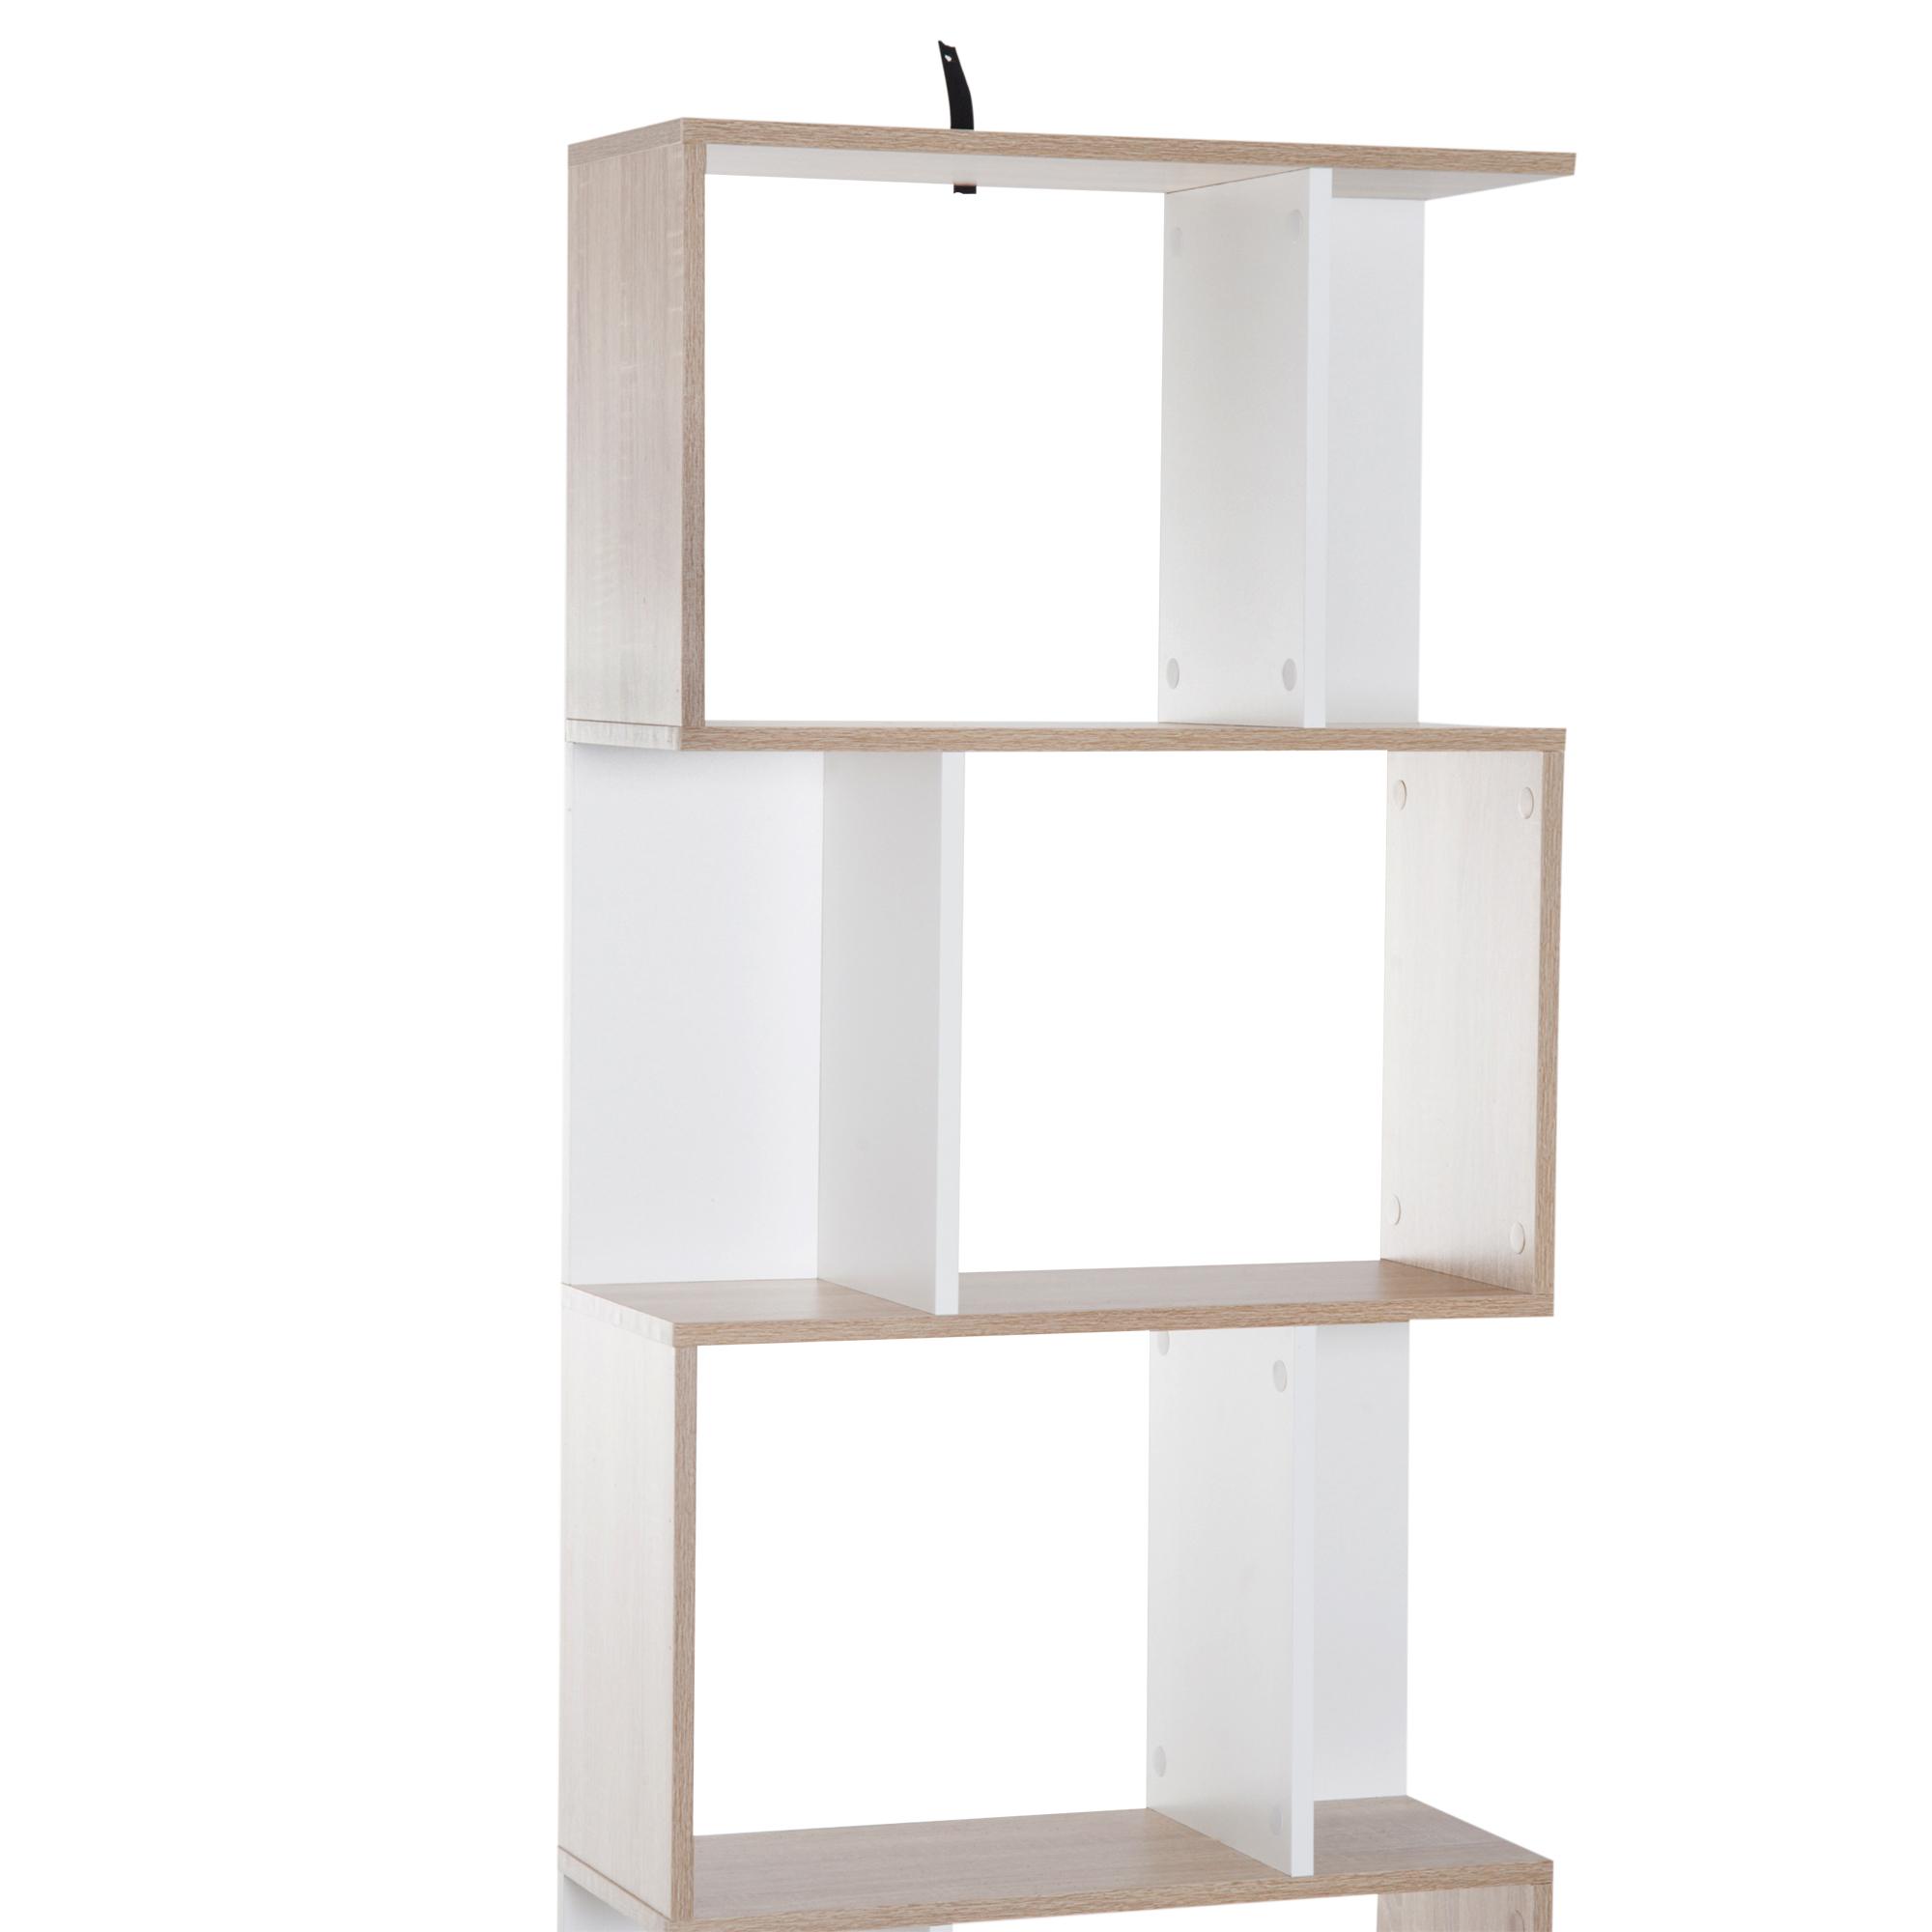 5-tier Bookcase Storage Display Shelving S Shape design Unit Divider Particle